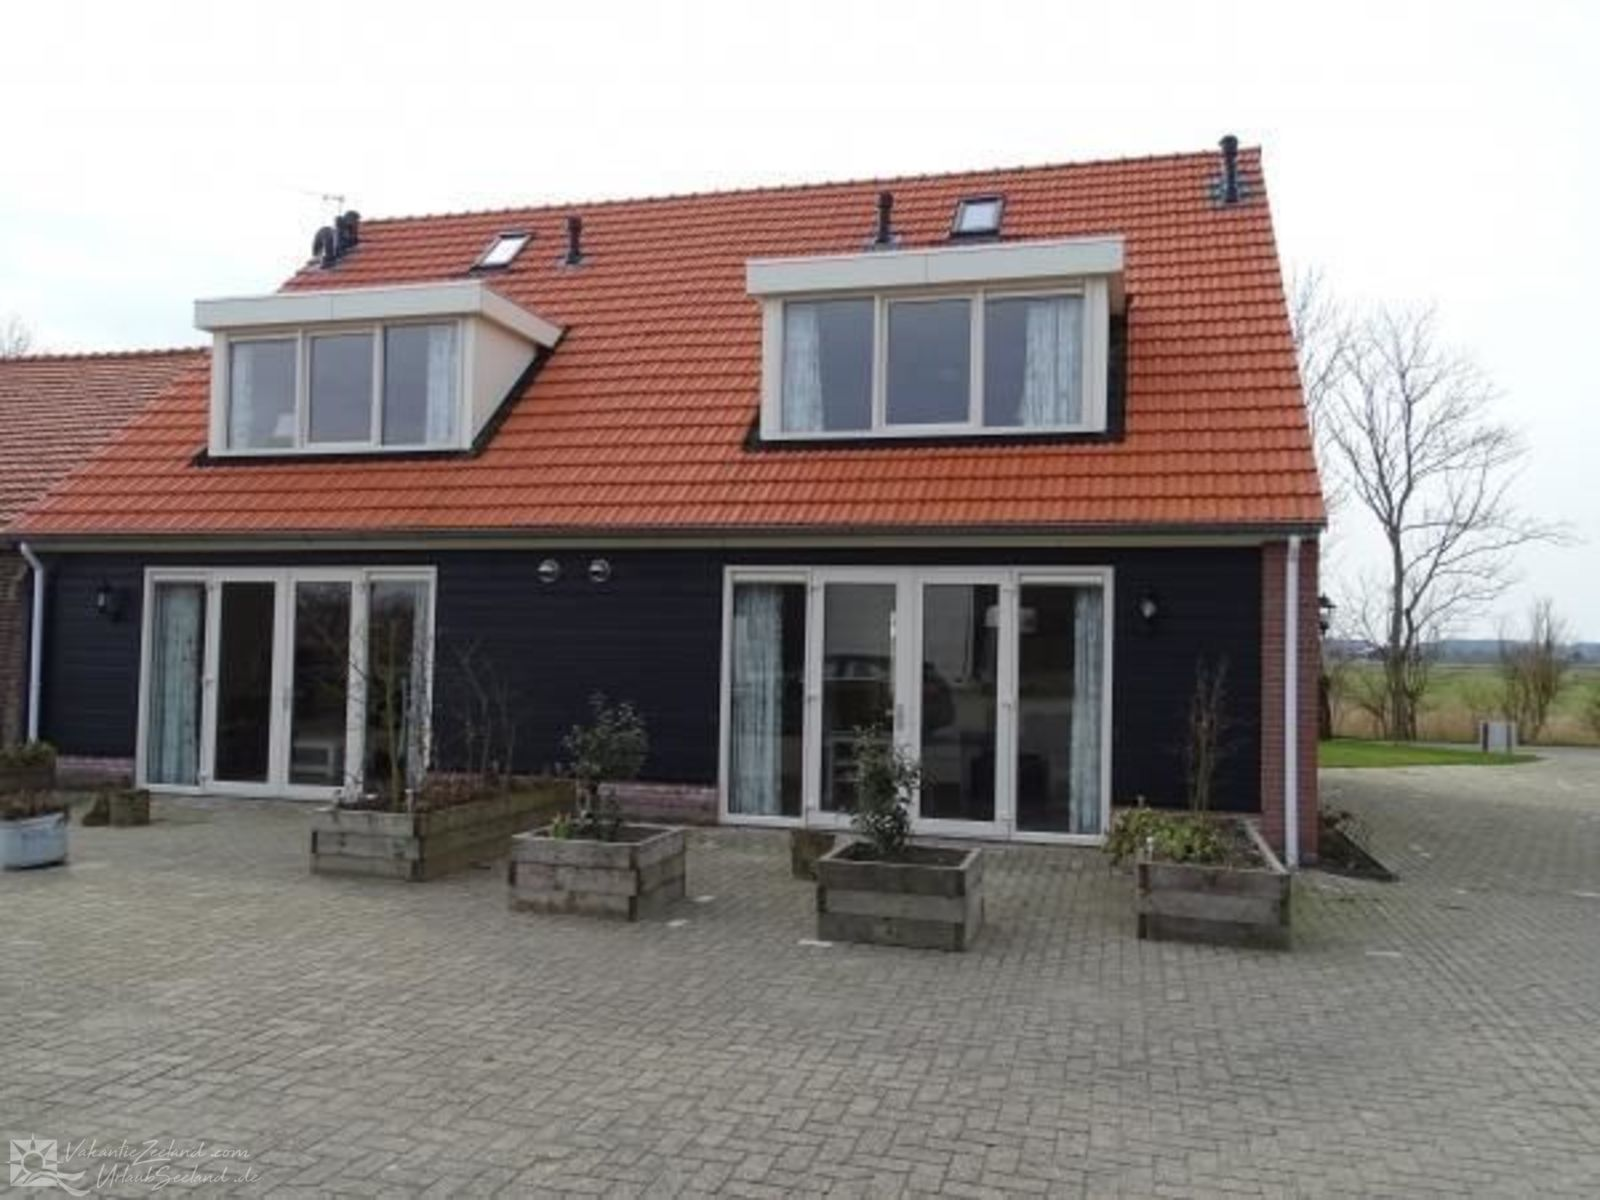 VZ532 Vakantieappartement Koudekerke-Dishoek